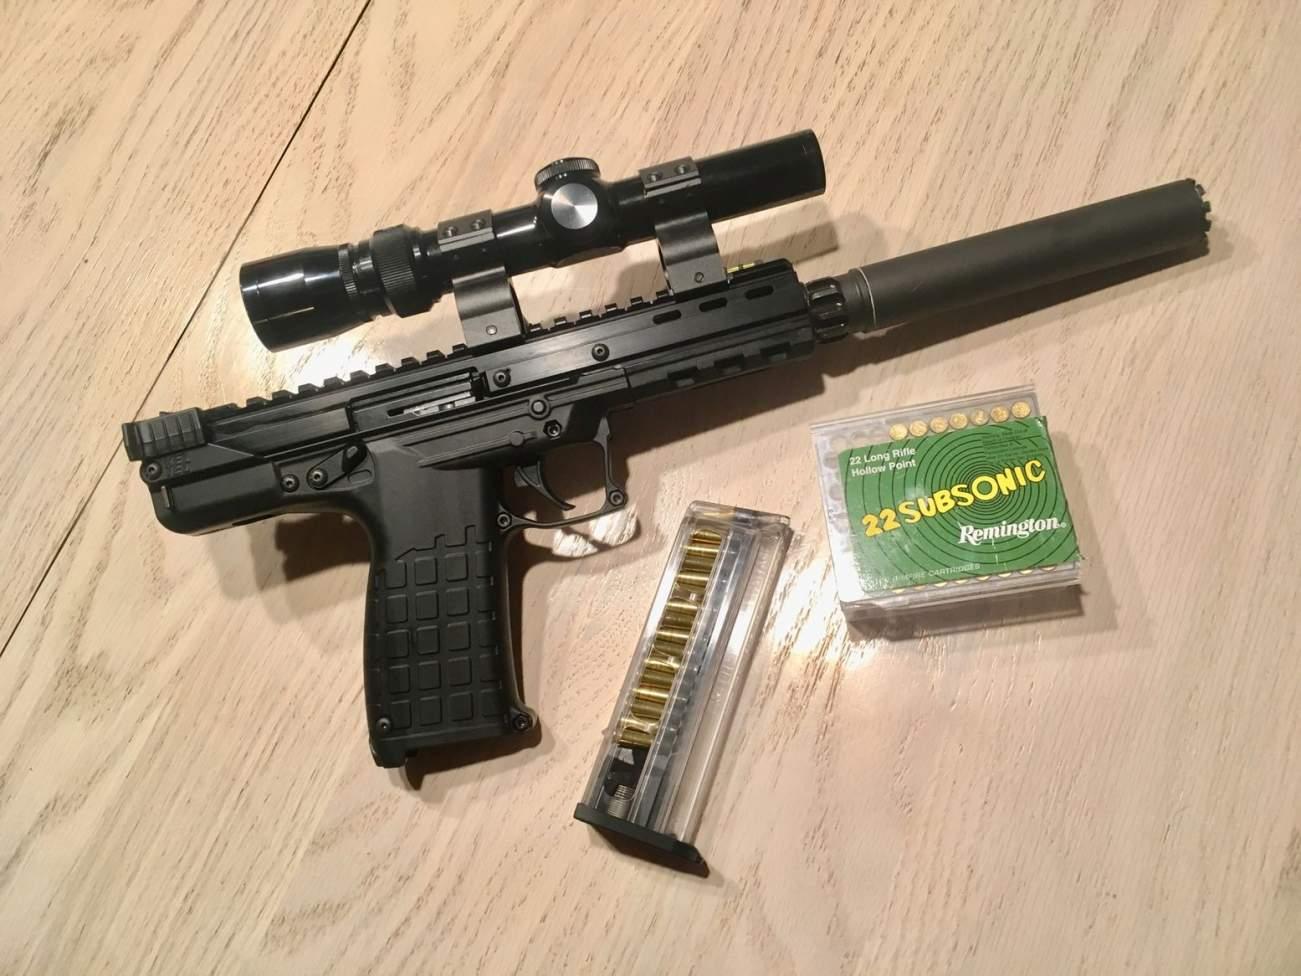 WKD: The Reason Why Kel-Tec's New CP33 Gun Is so Popular